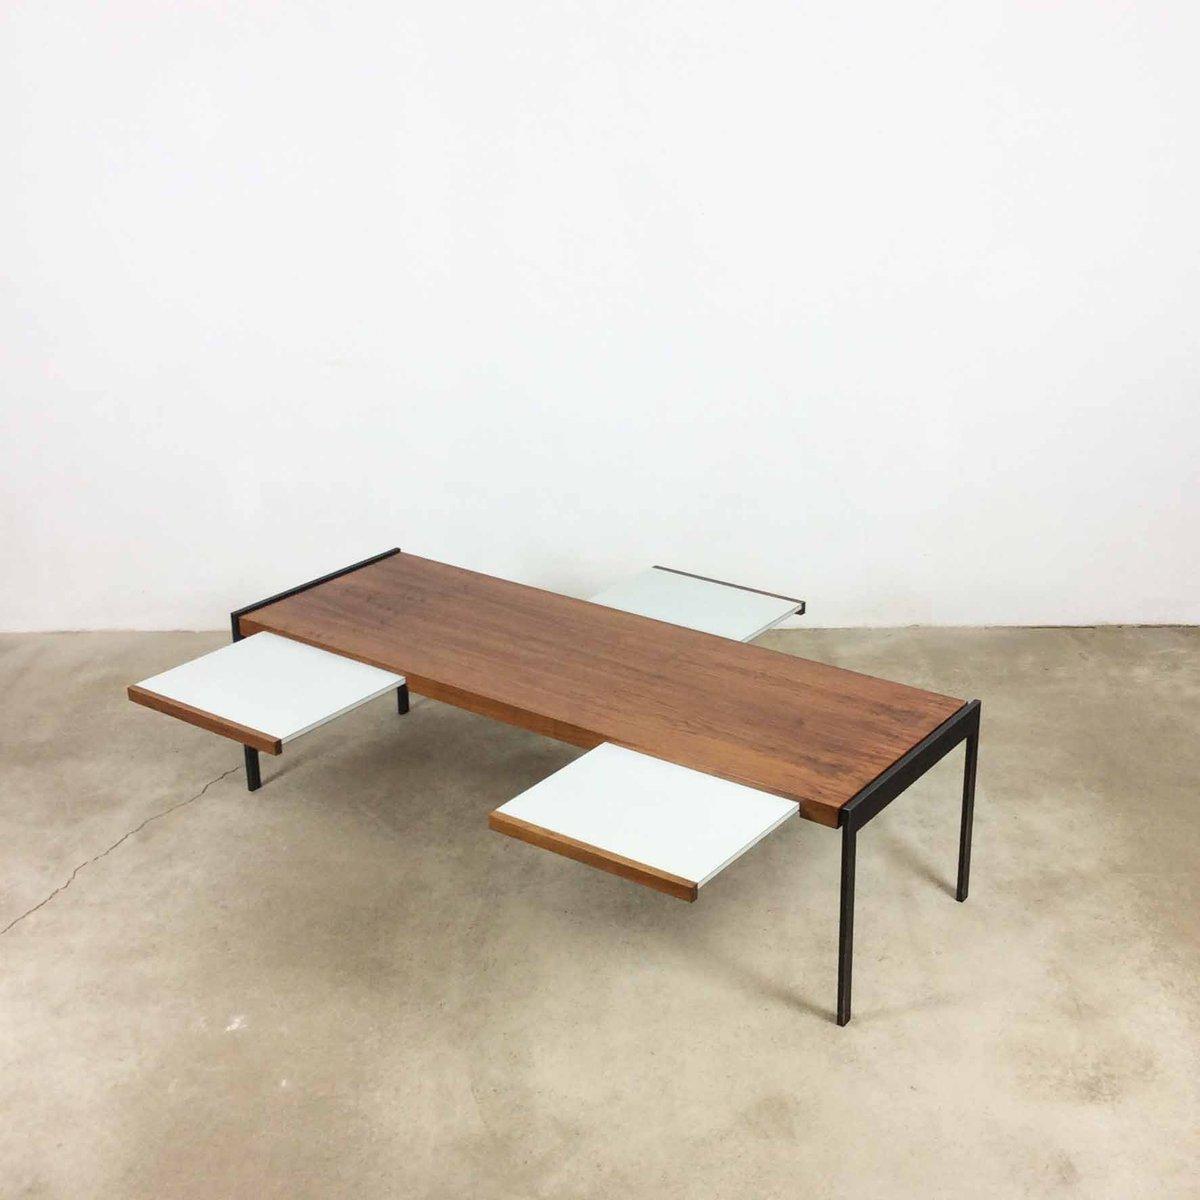 table basse en noyer par wilhelm renz 1960s en vente sur pamono. Black Bedroom Furniture Sets. Home Design Ideas